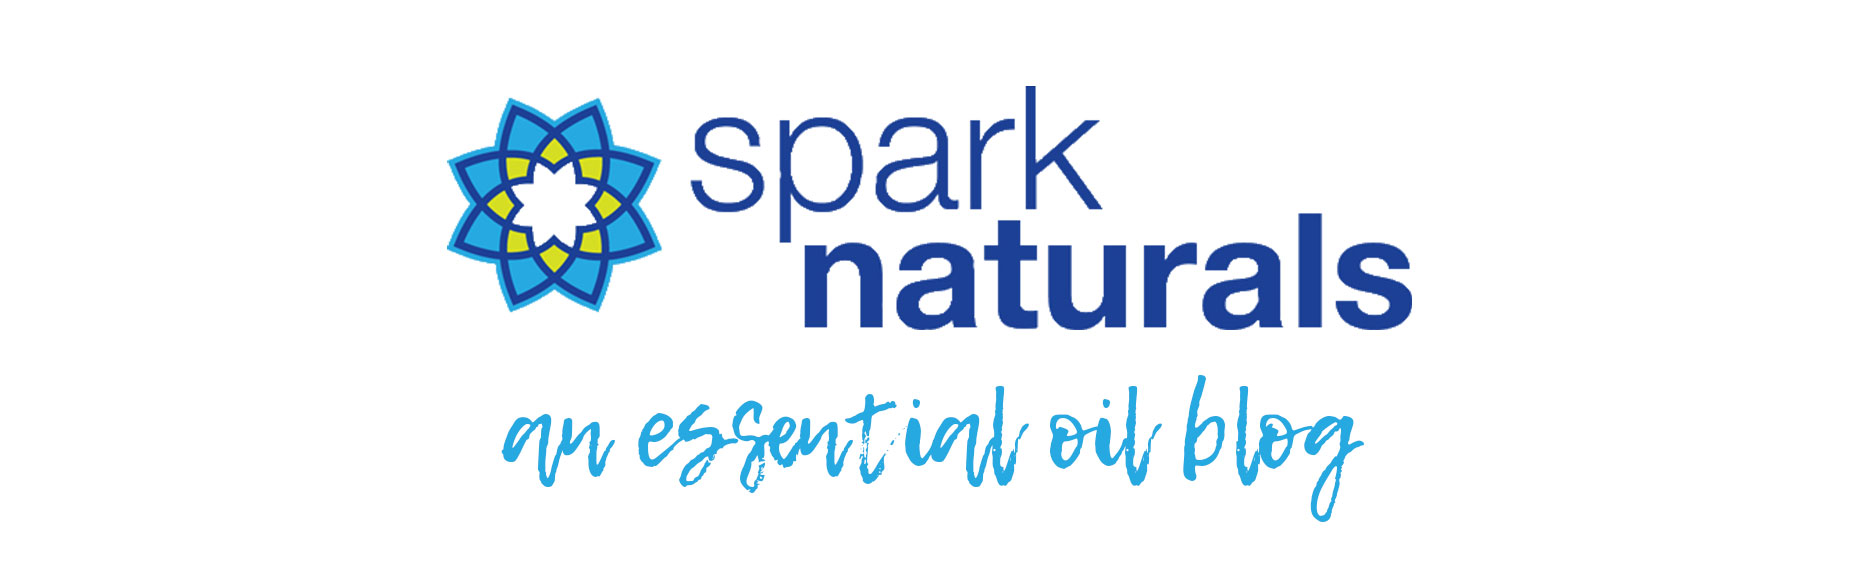 Spark Naturals Blog